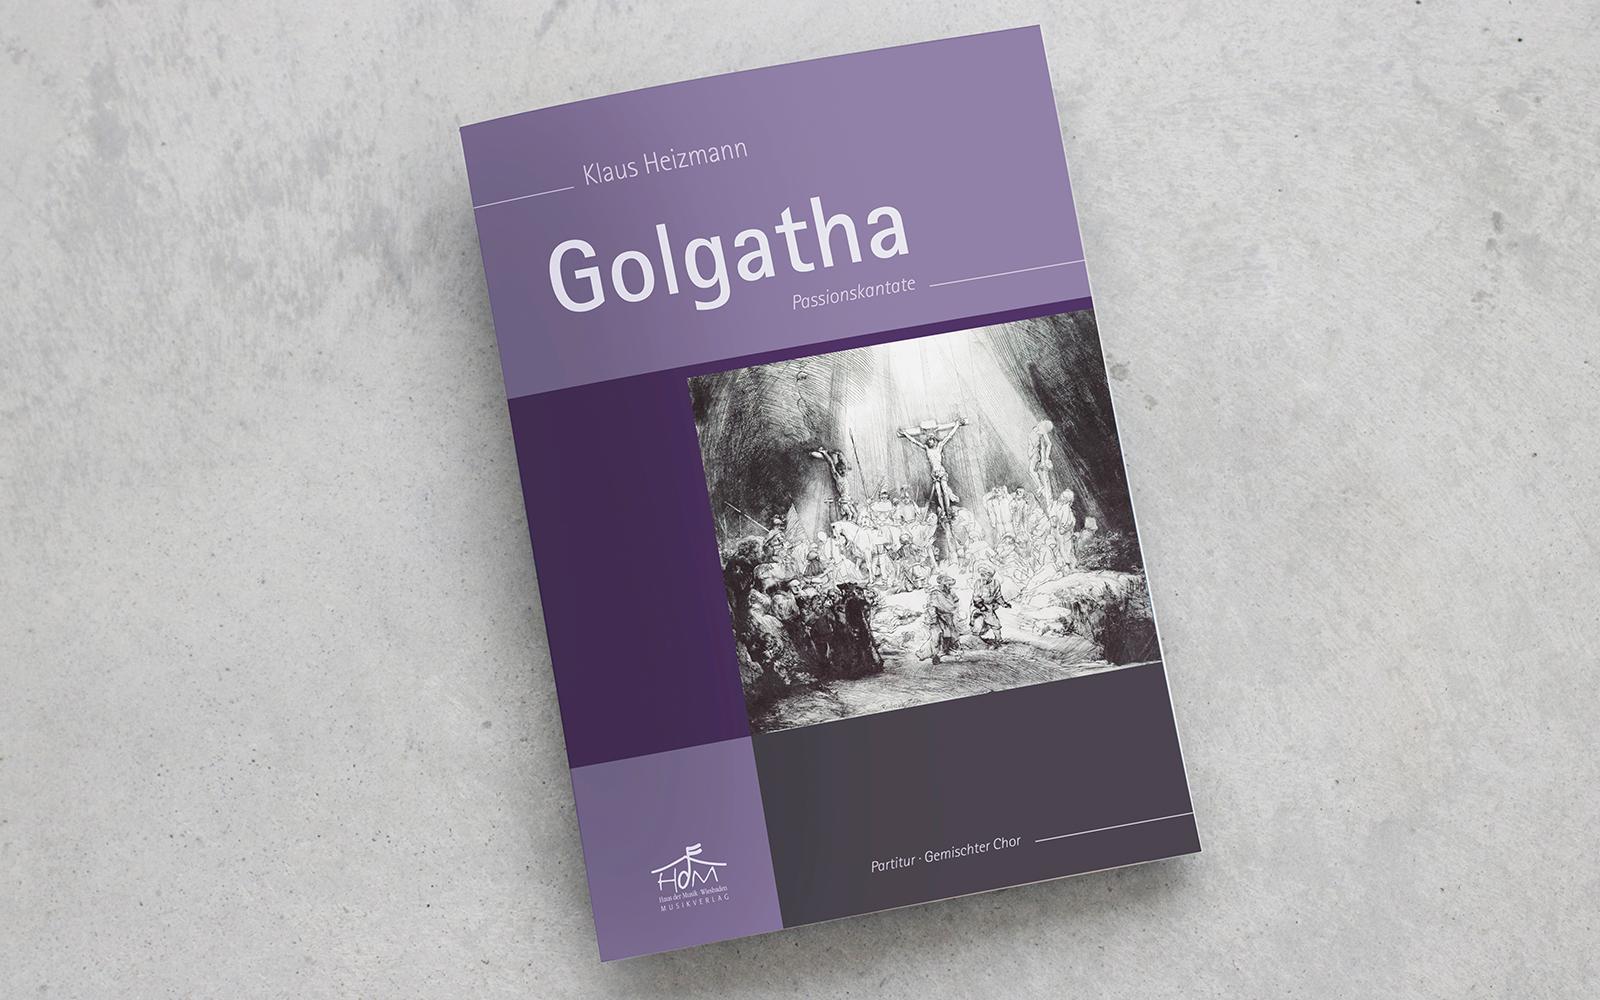 HDM_Golgatha_hell_RGB_1600x1000_RZ